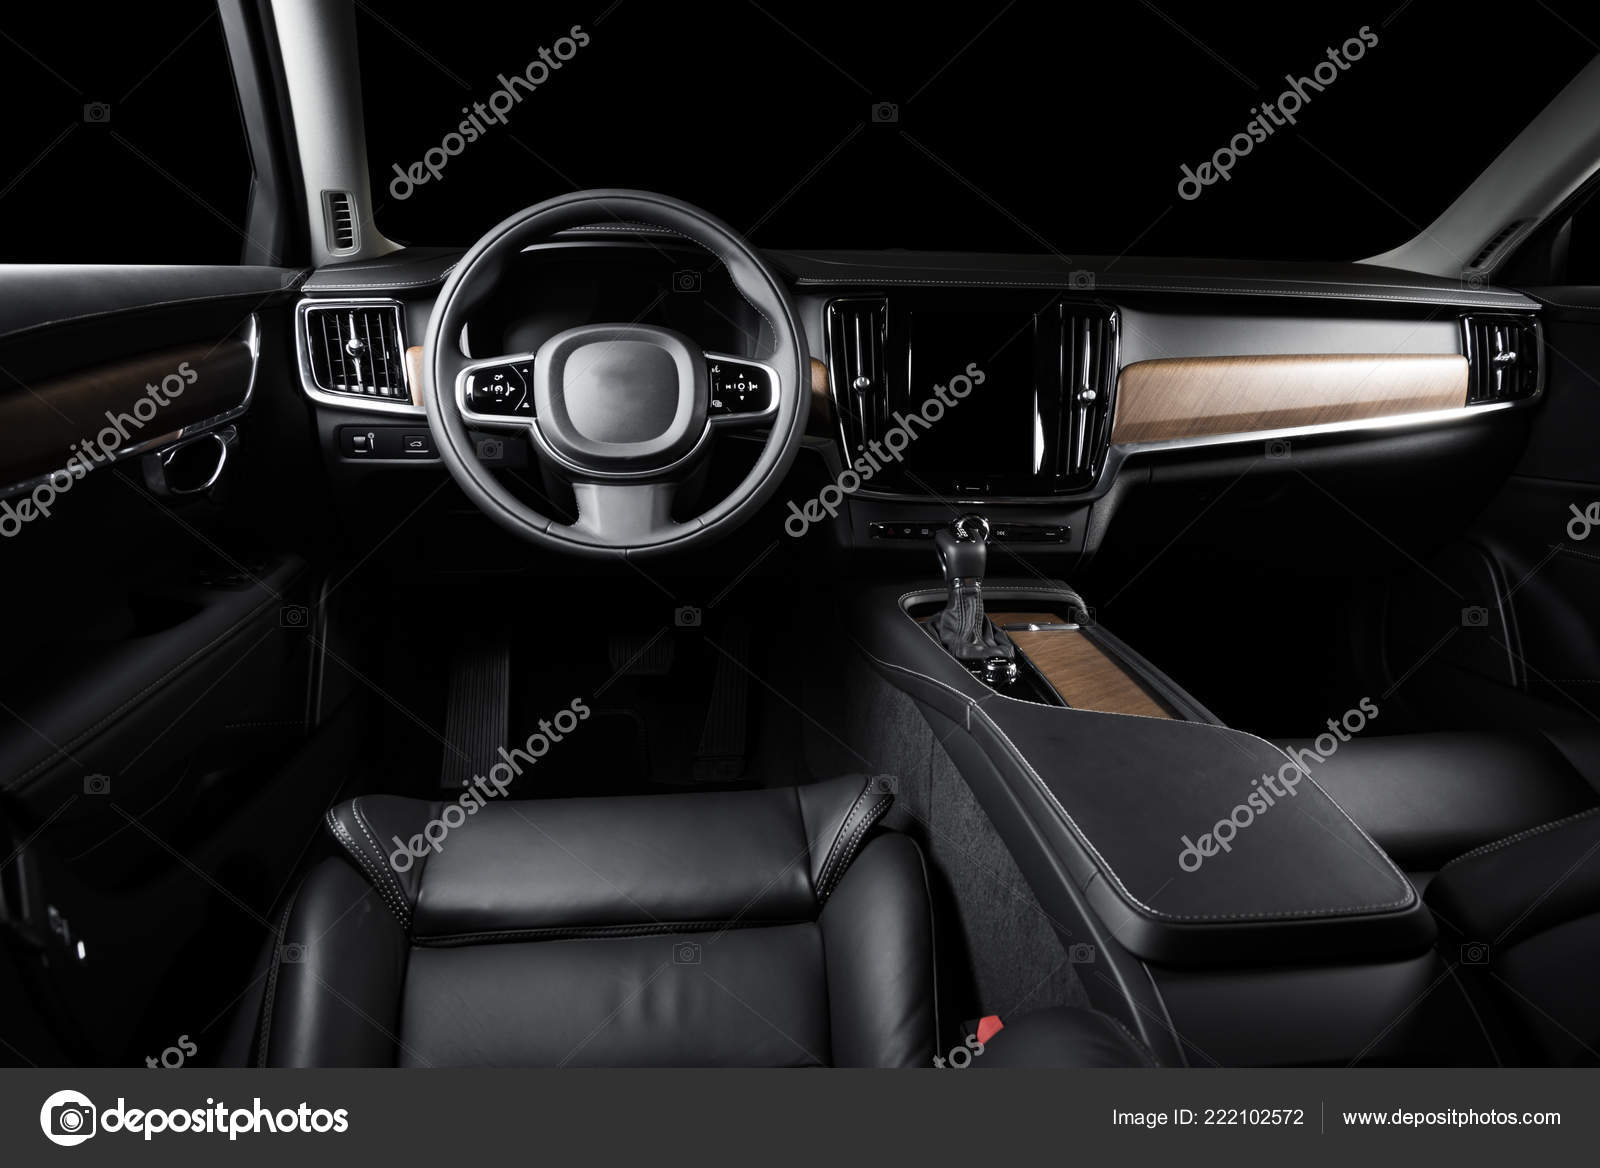 Dark Luxury Car Interior Steering Wheel Shift Lever Dashboard Car